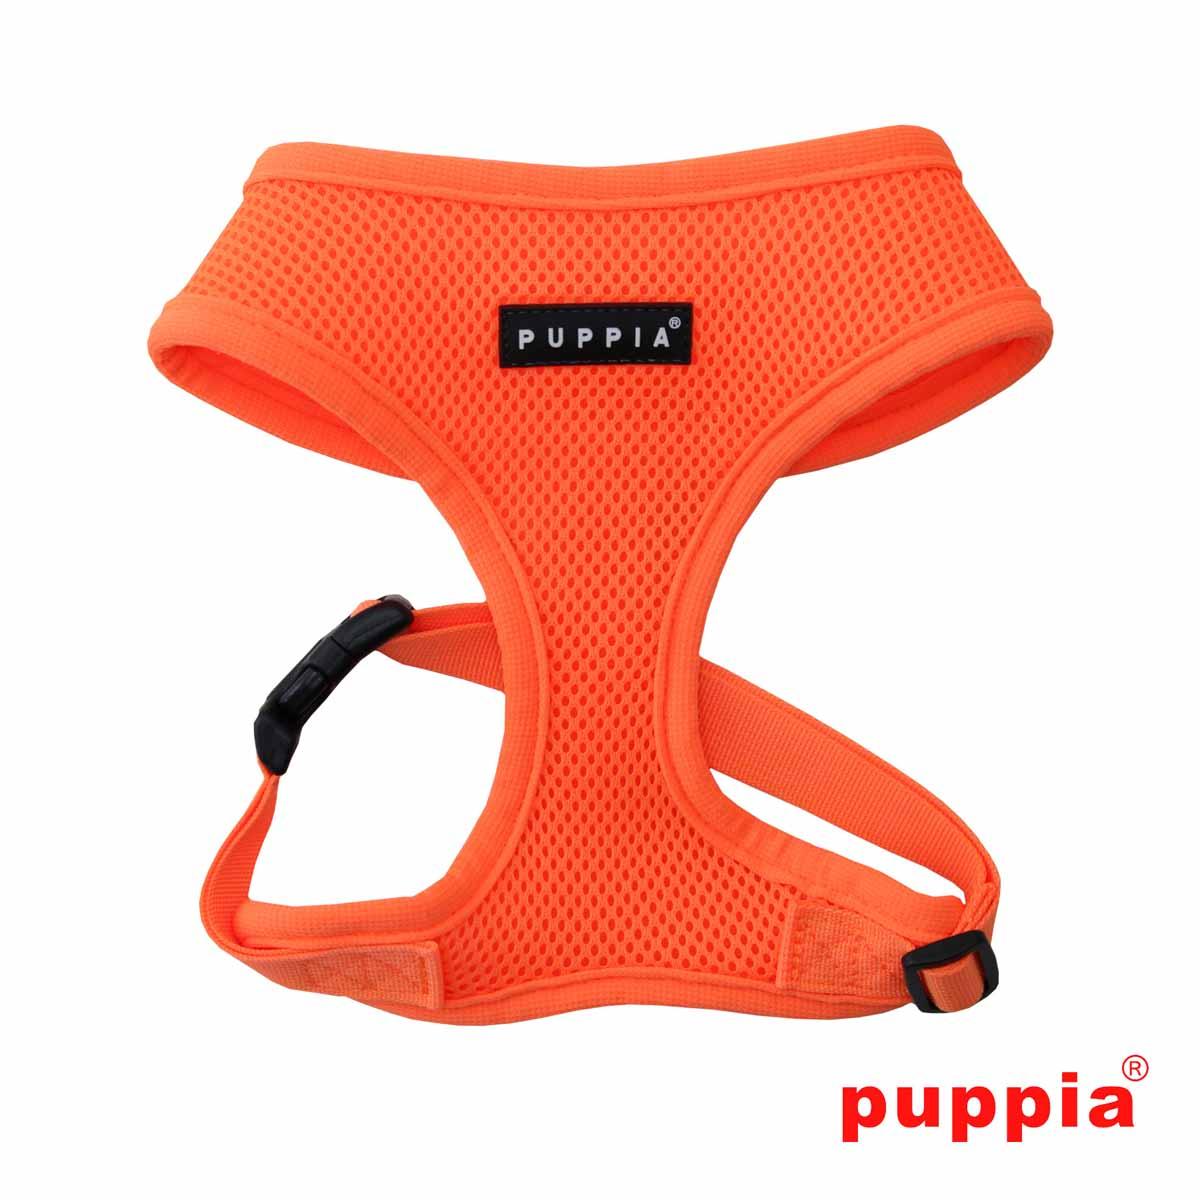 Neon Soft Adjustable Dog Harness by Puppia - Orange